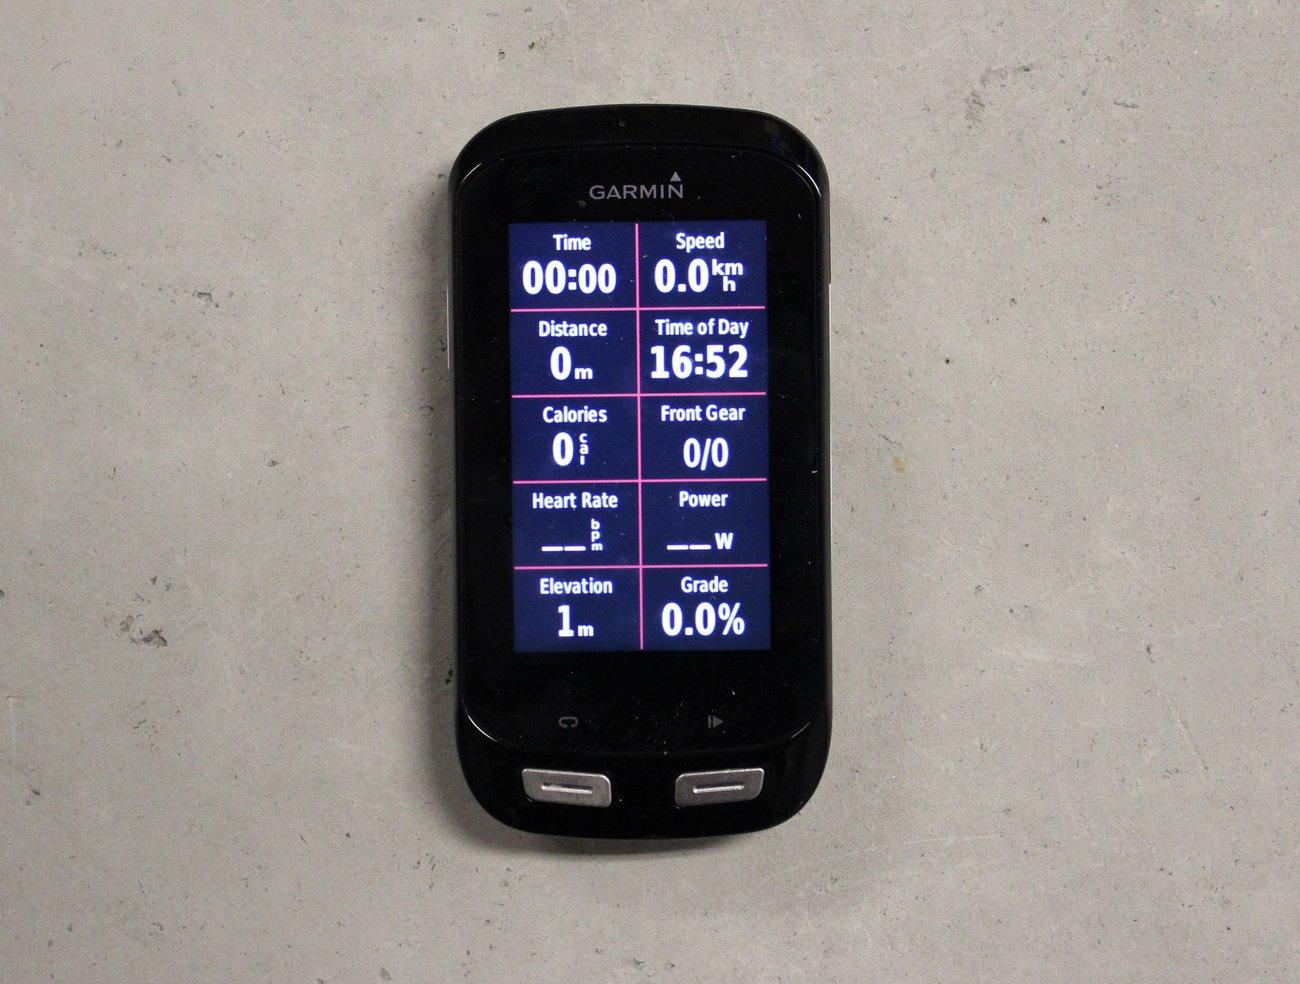 Garmin Edge 1000 GPS cycling computer (Pic: George Scott/Factory Media)